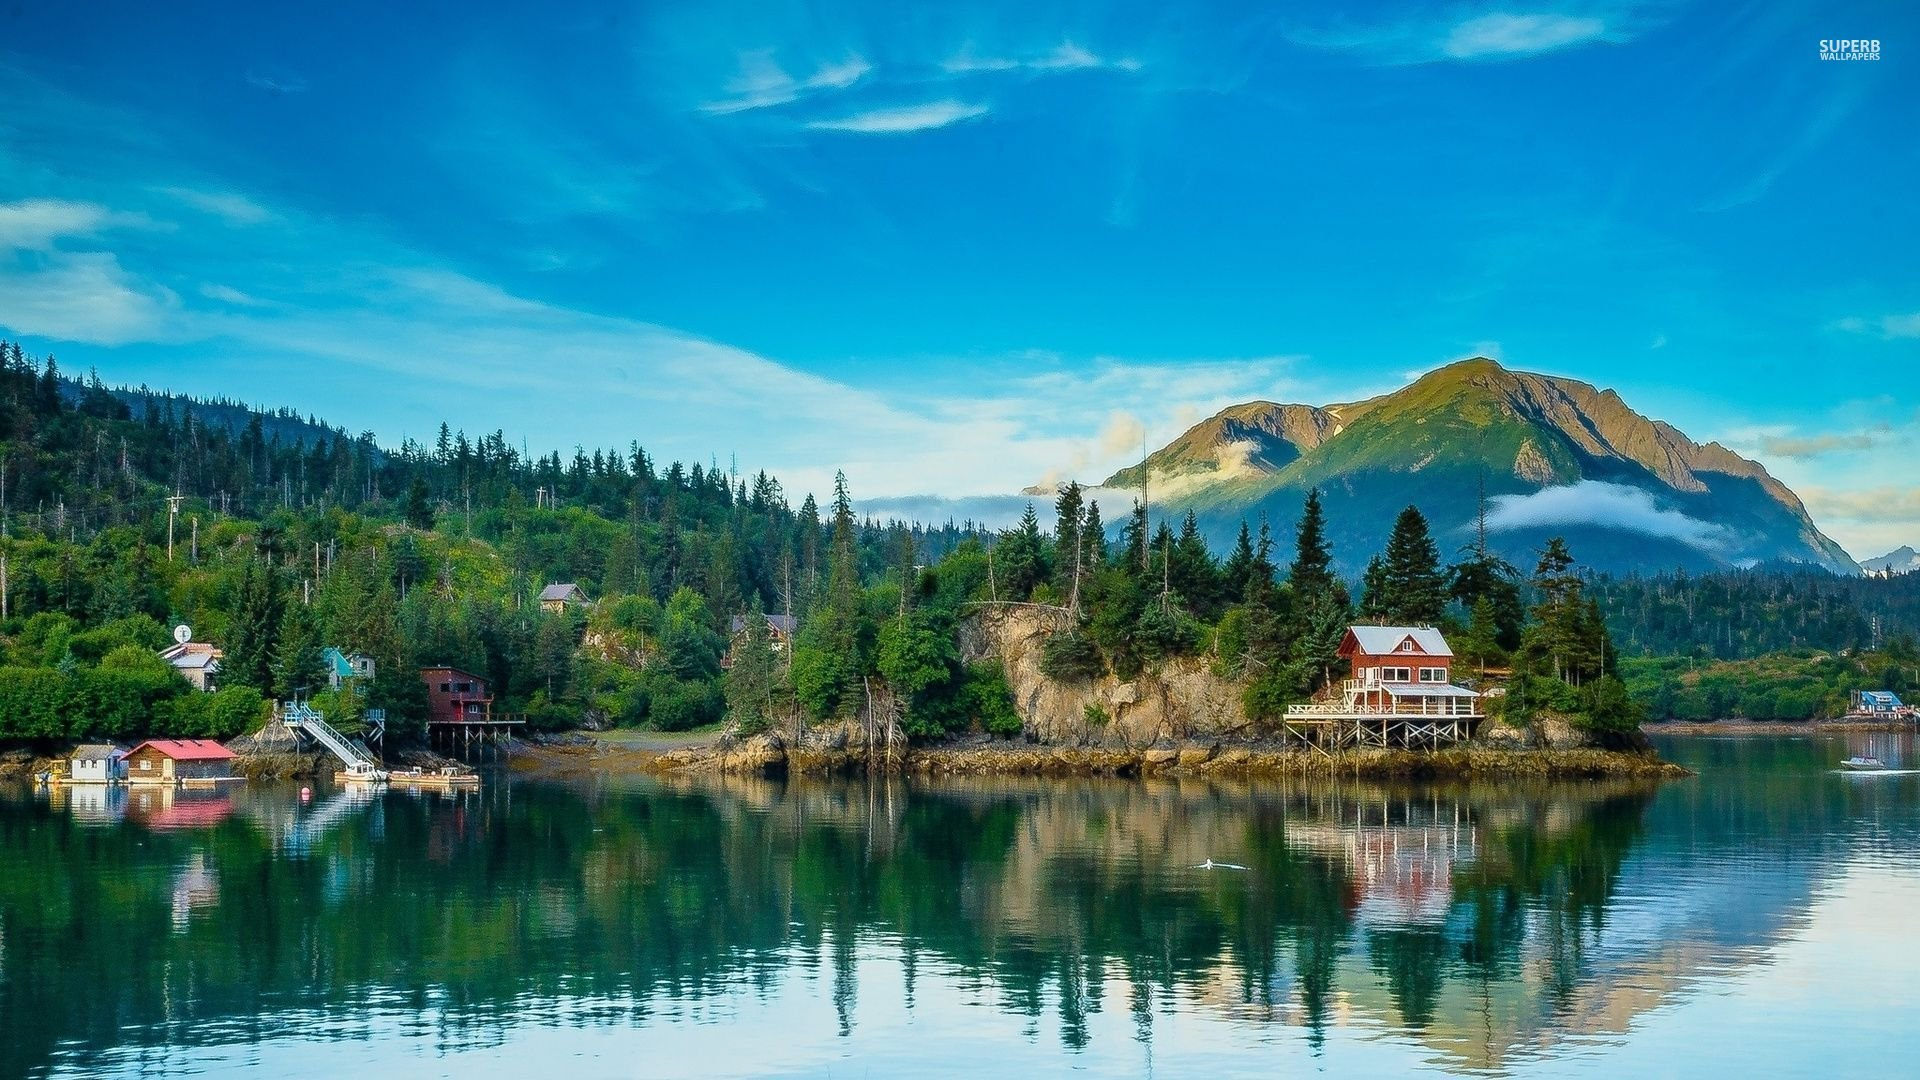 Fall Wallpaper Hd For Galaxy S4 Village In Alaska Hd Wallpaper